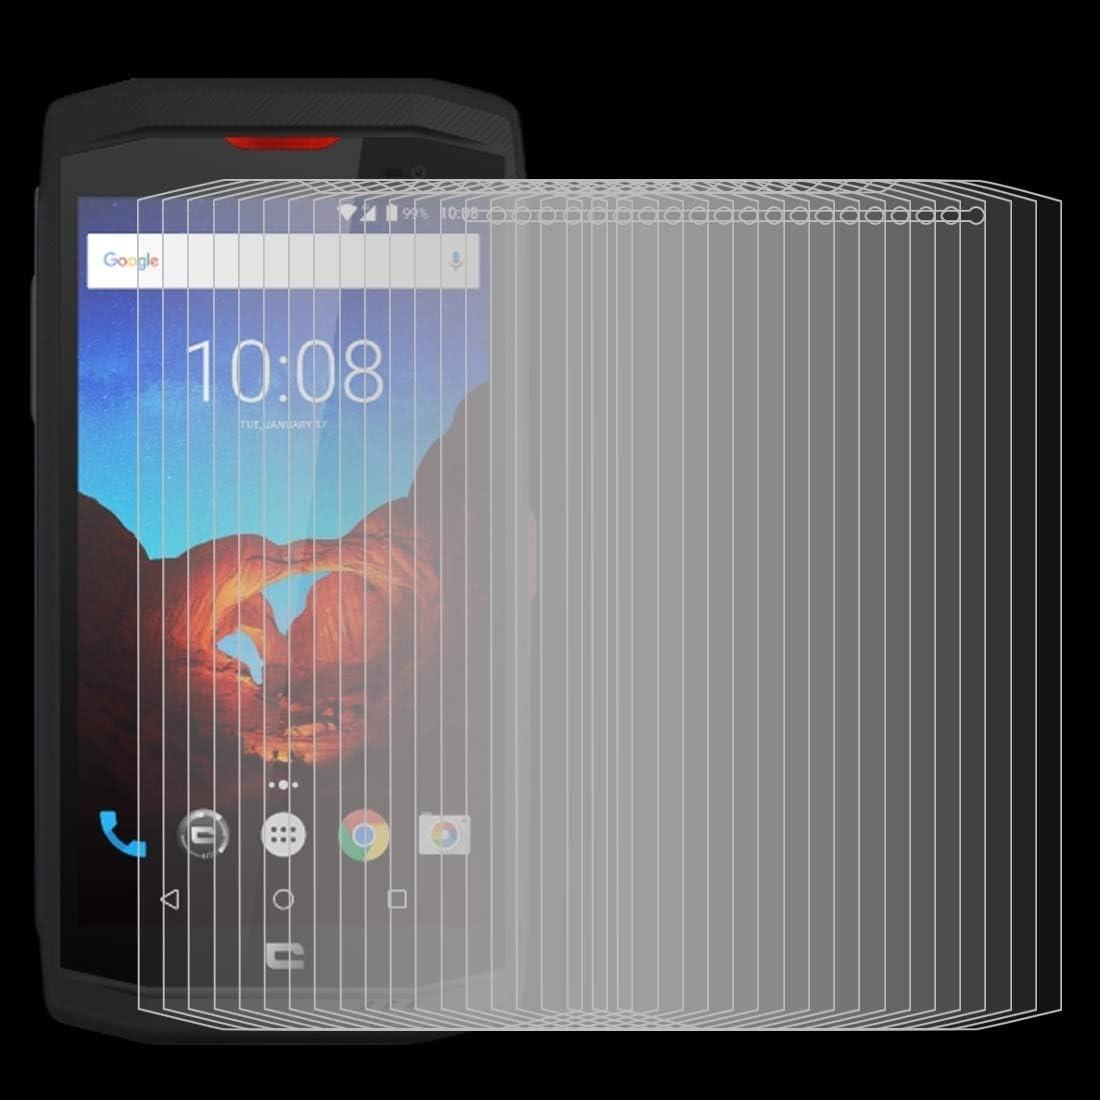 No Retail Package Lihuoxiu Phone Screen Protectors 100 PCS for Crosscall Trekker X3 0.3mm Tempered Glass Film